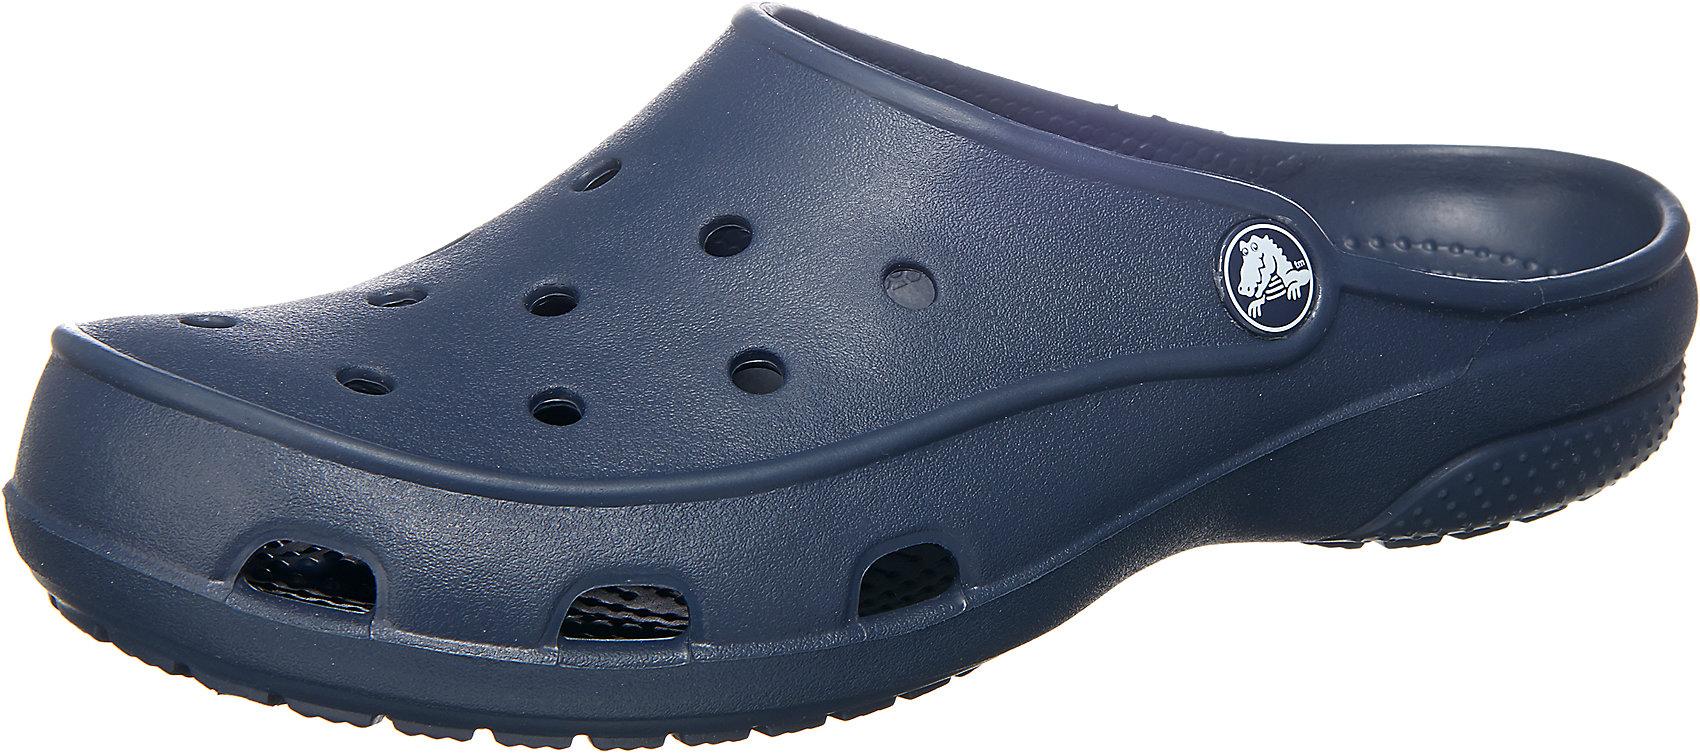 Details zu Neu Crocs Freesail Clog W Navy Clogs 5748485 für Damen